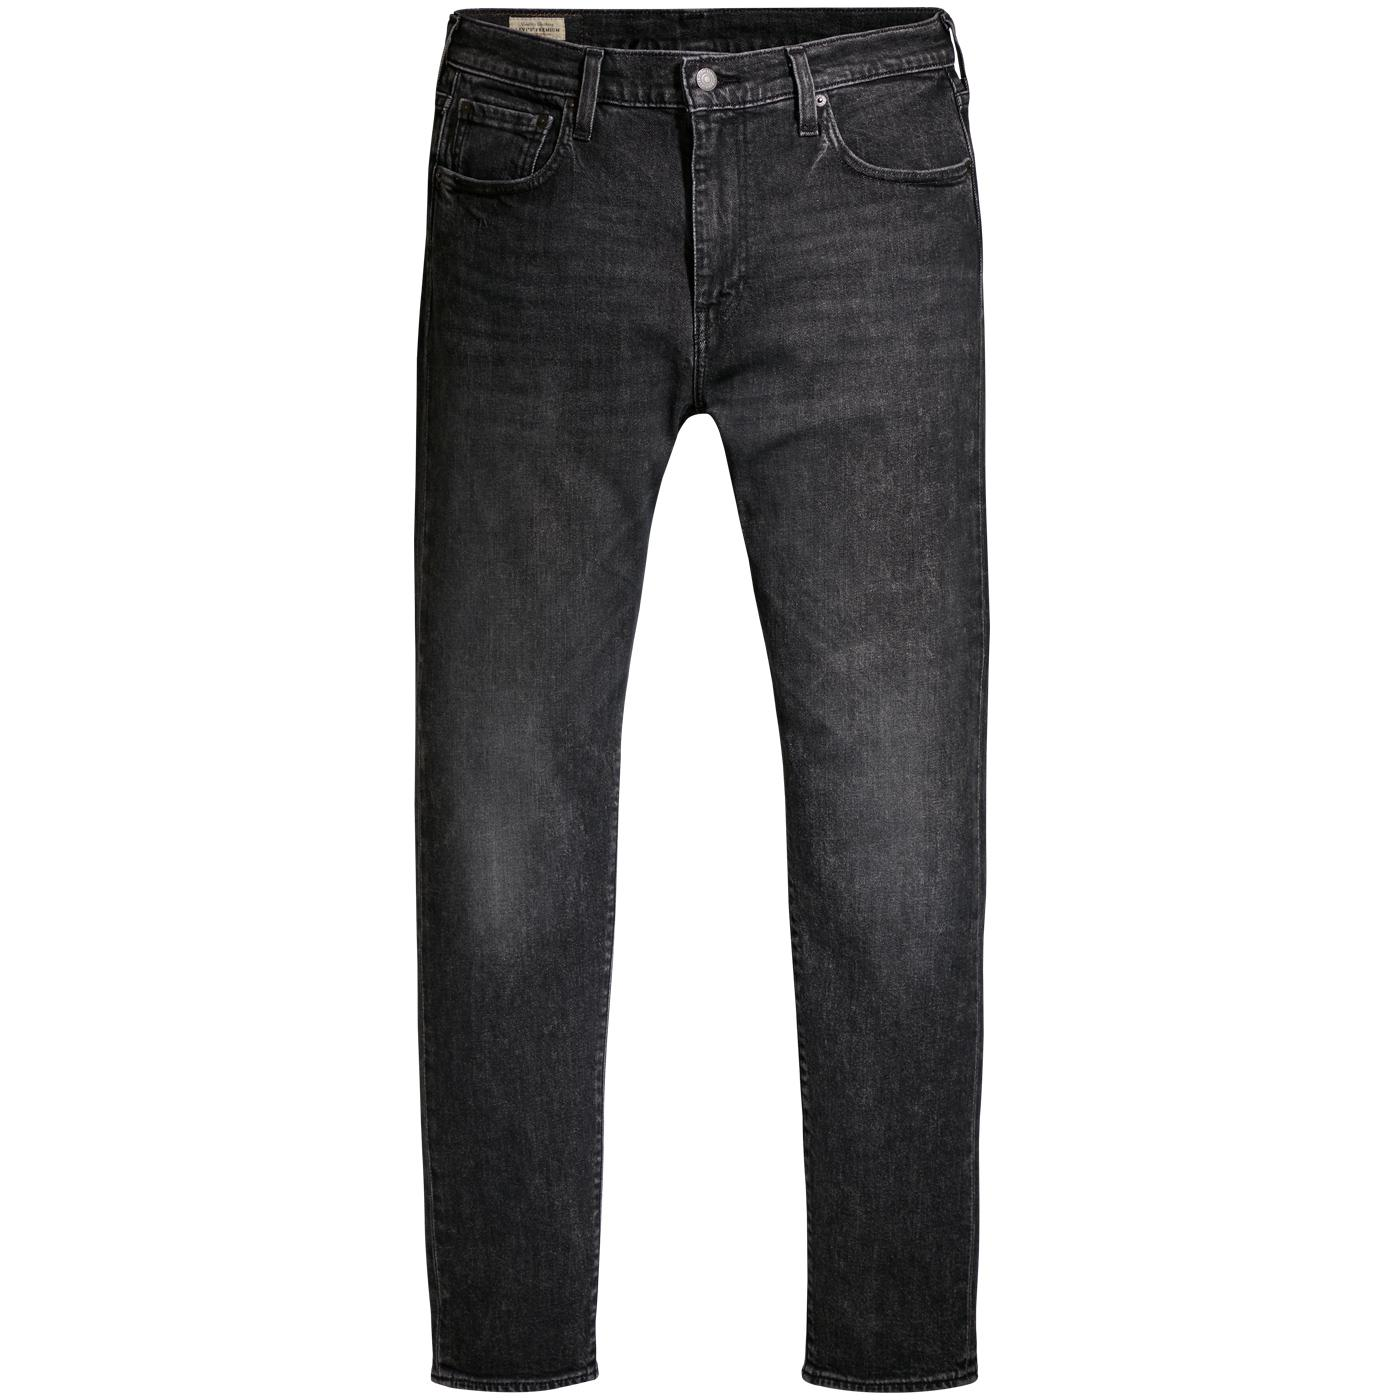 LEVI'S 512 Slim Taper Jeans (Smoke On The Pond)